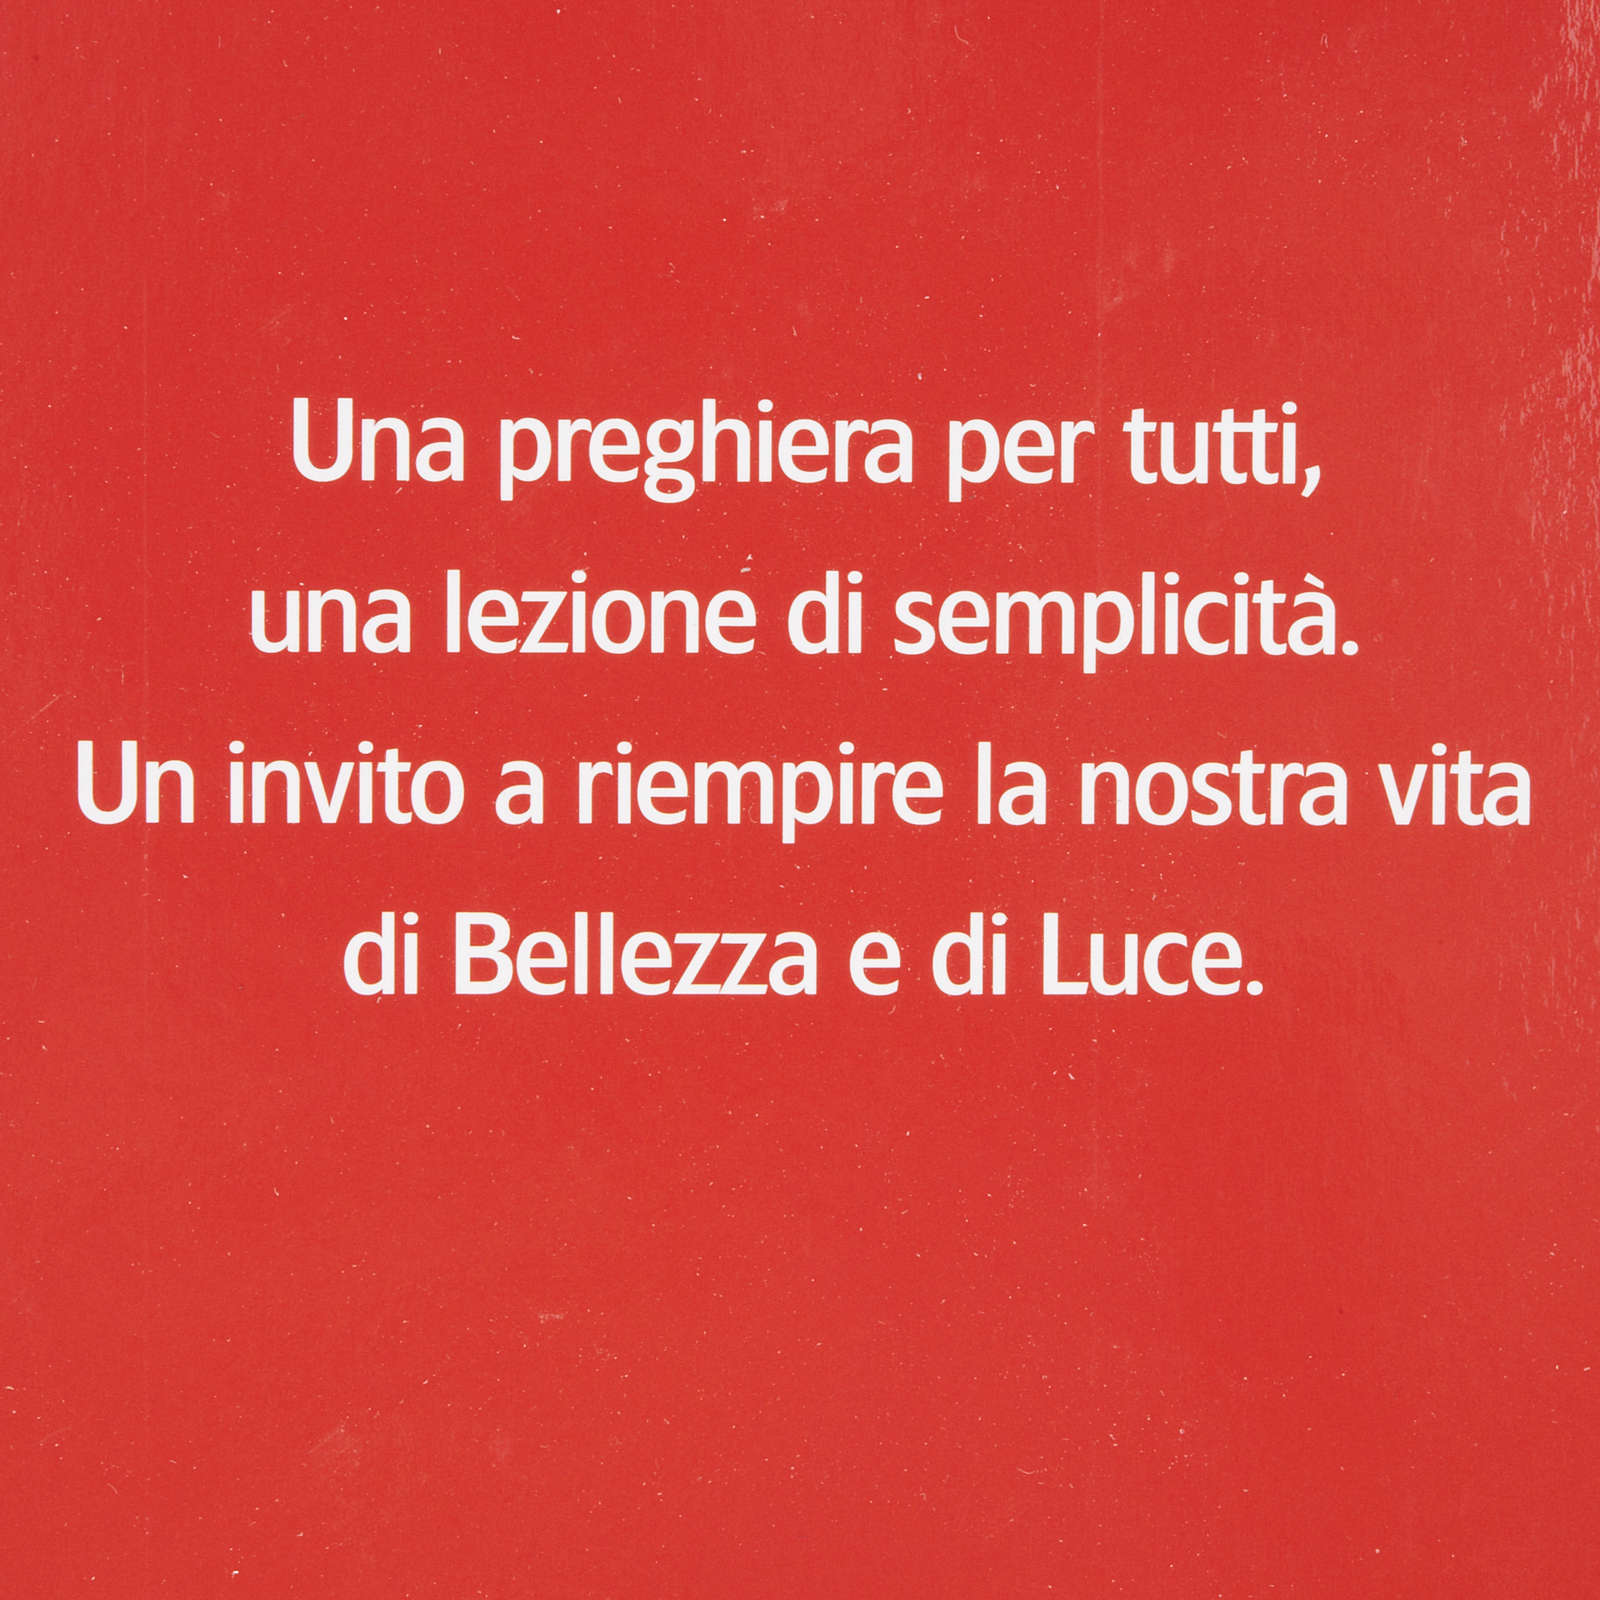 Preghiera semplice di Francesco d'Assisi 4